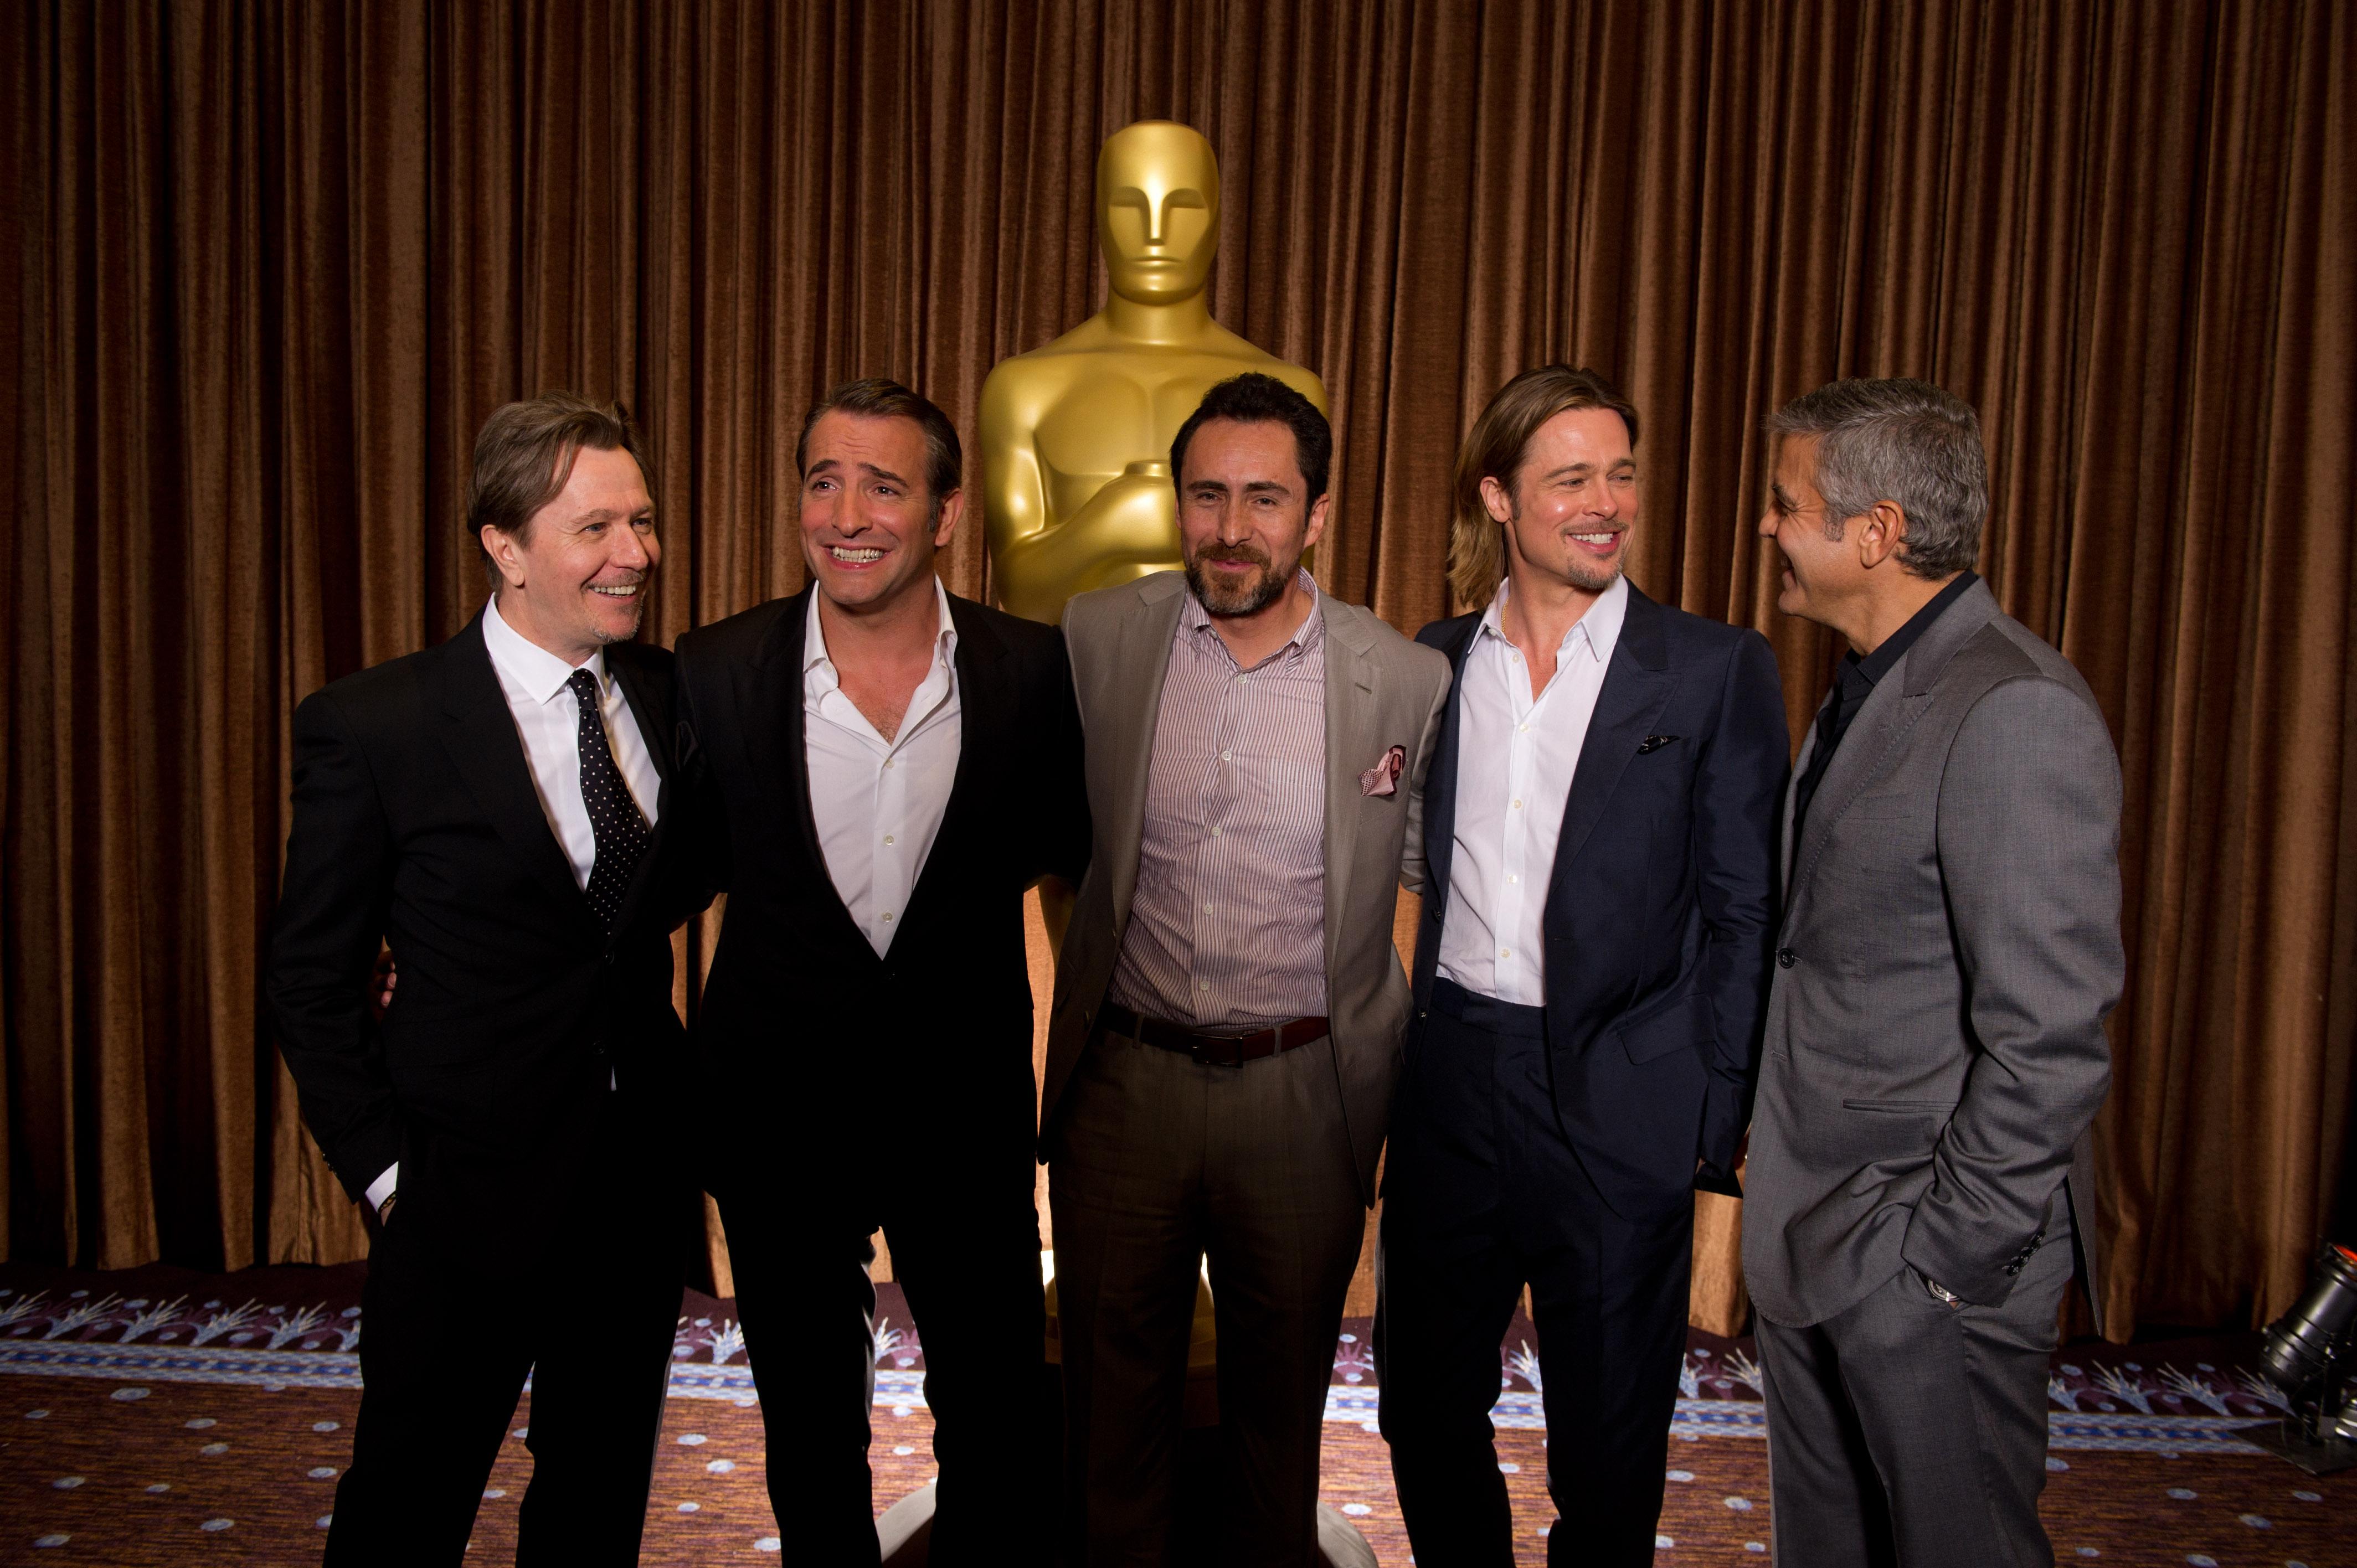 Nominados al Oscar 2012, Demian Bichir, Jean Dujardin, George Clooney ...